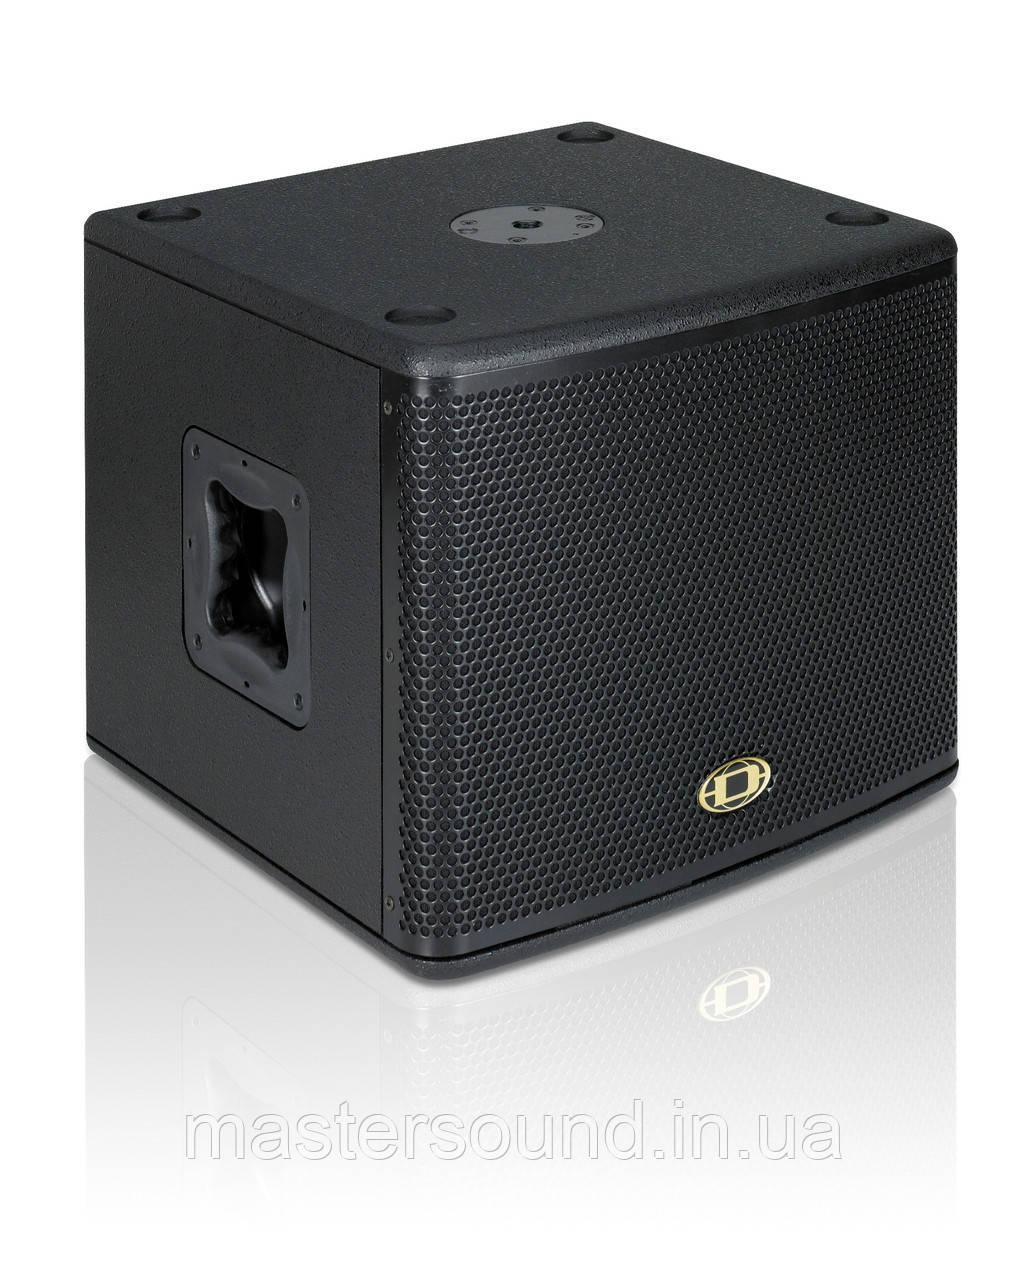 Активный сабвуфер Dynacord PS 112 Power Sub